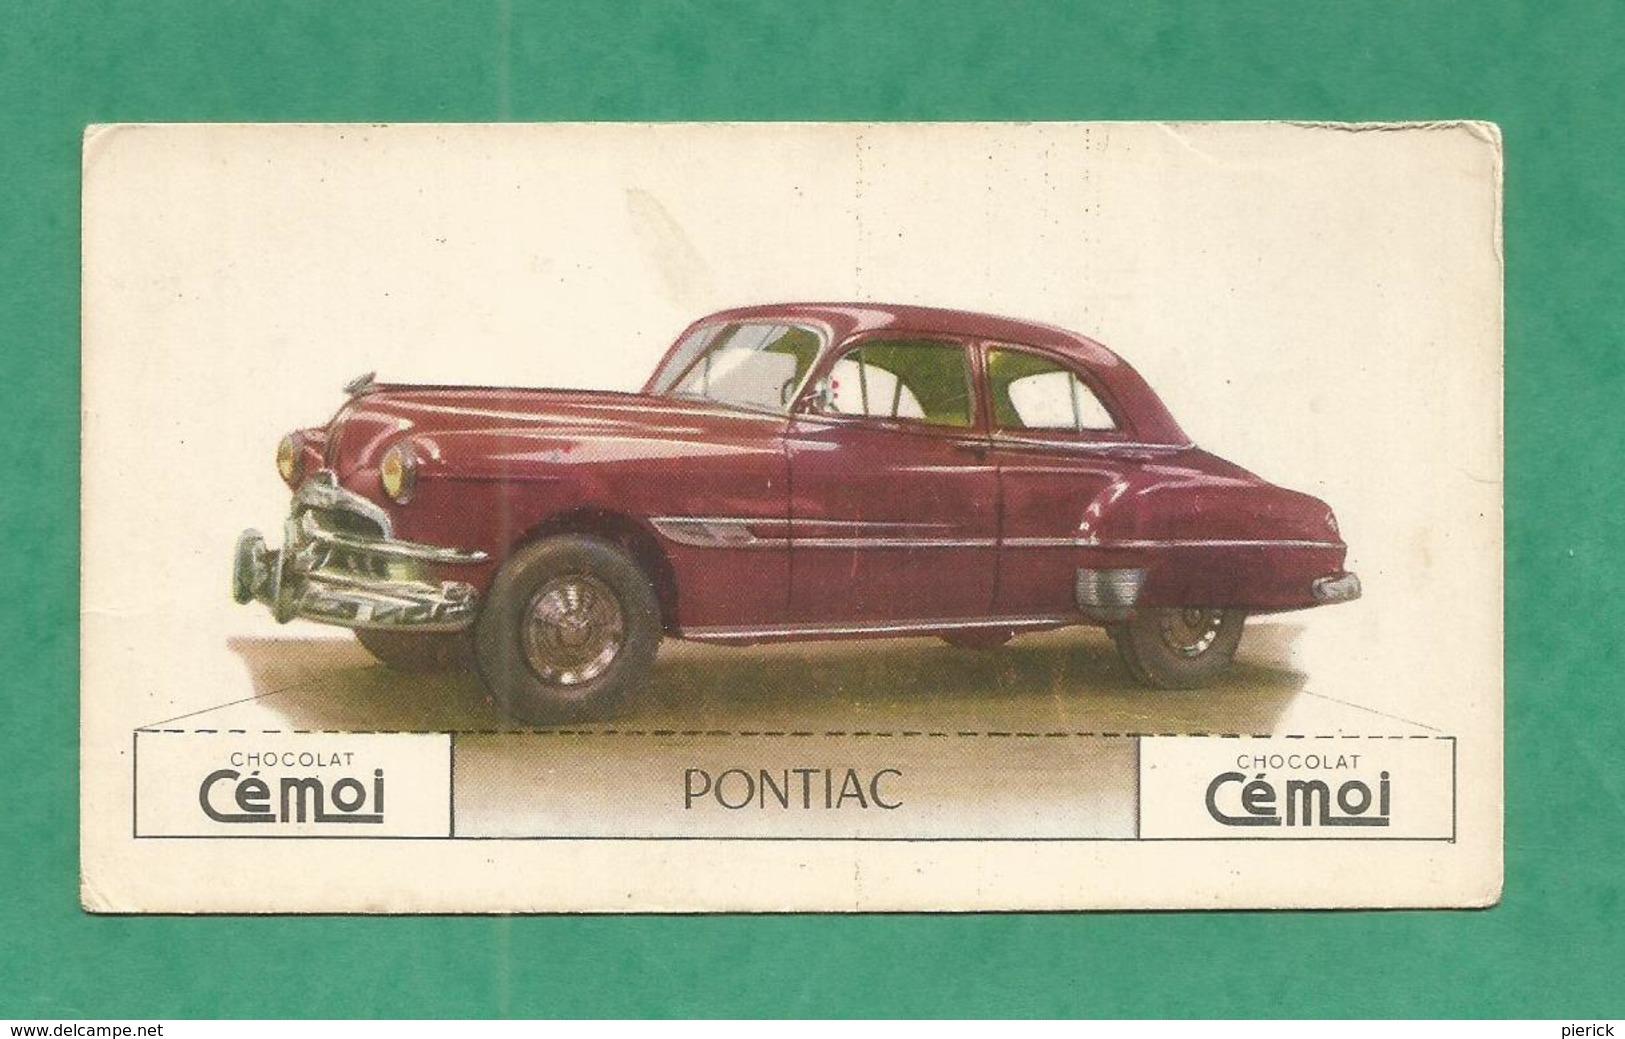 IMAGE CHOCOLAT CEMOI AUTO VOITURE VINTAGE WAGEN OLD CAR CARD  PONTIAC - Chocolat